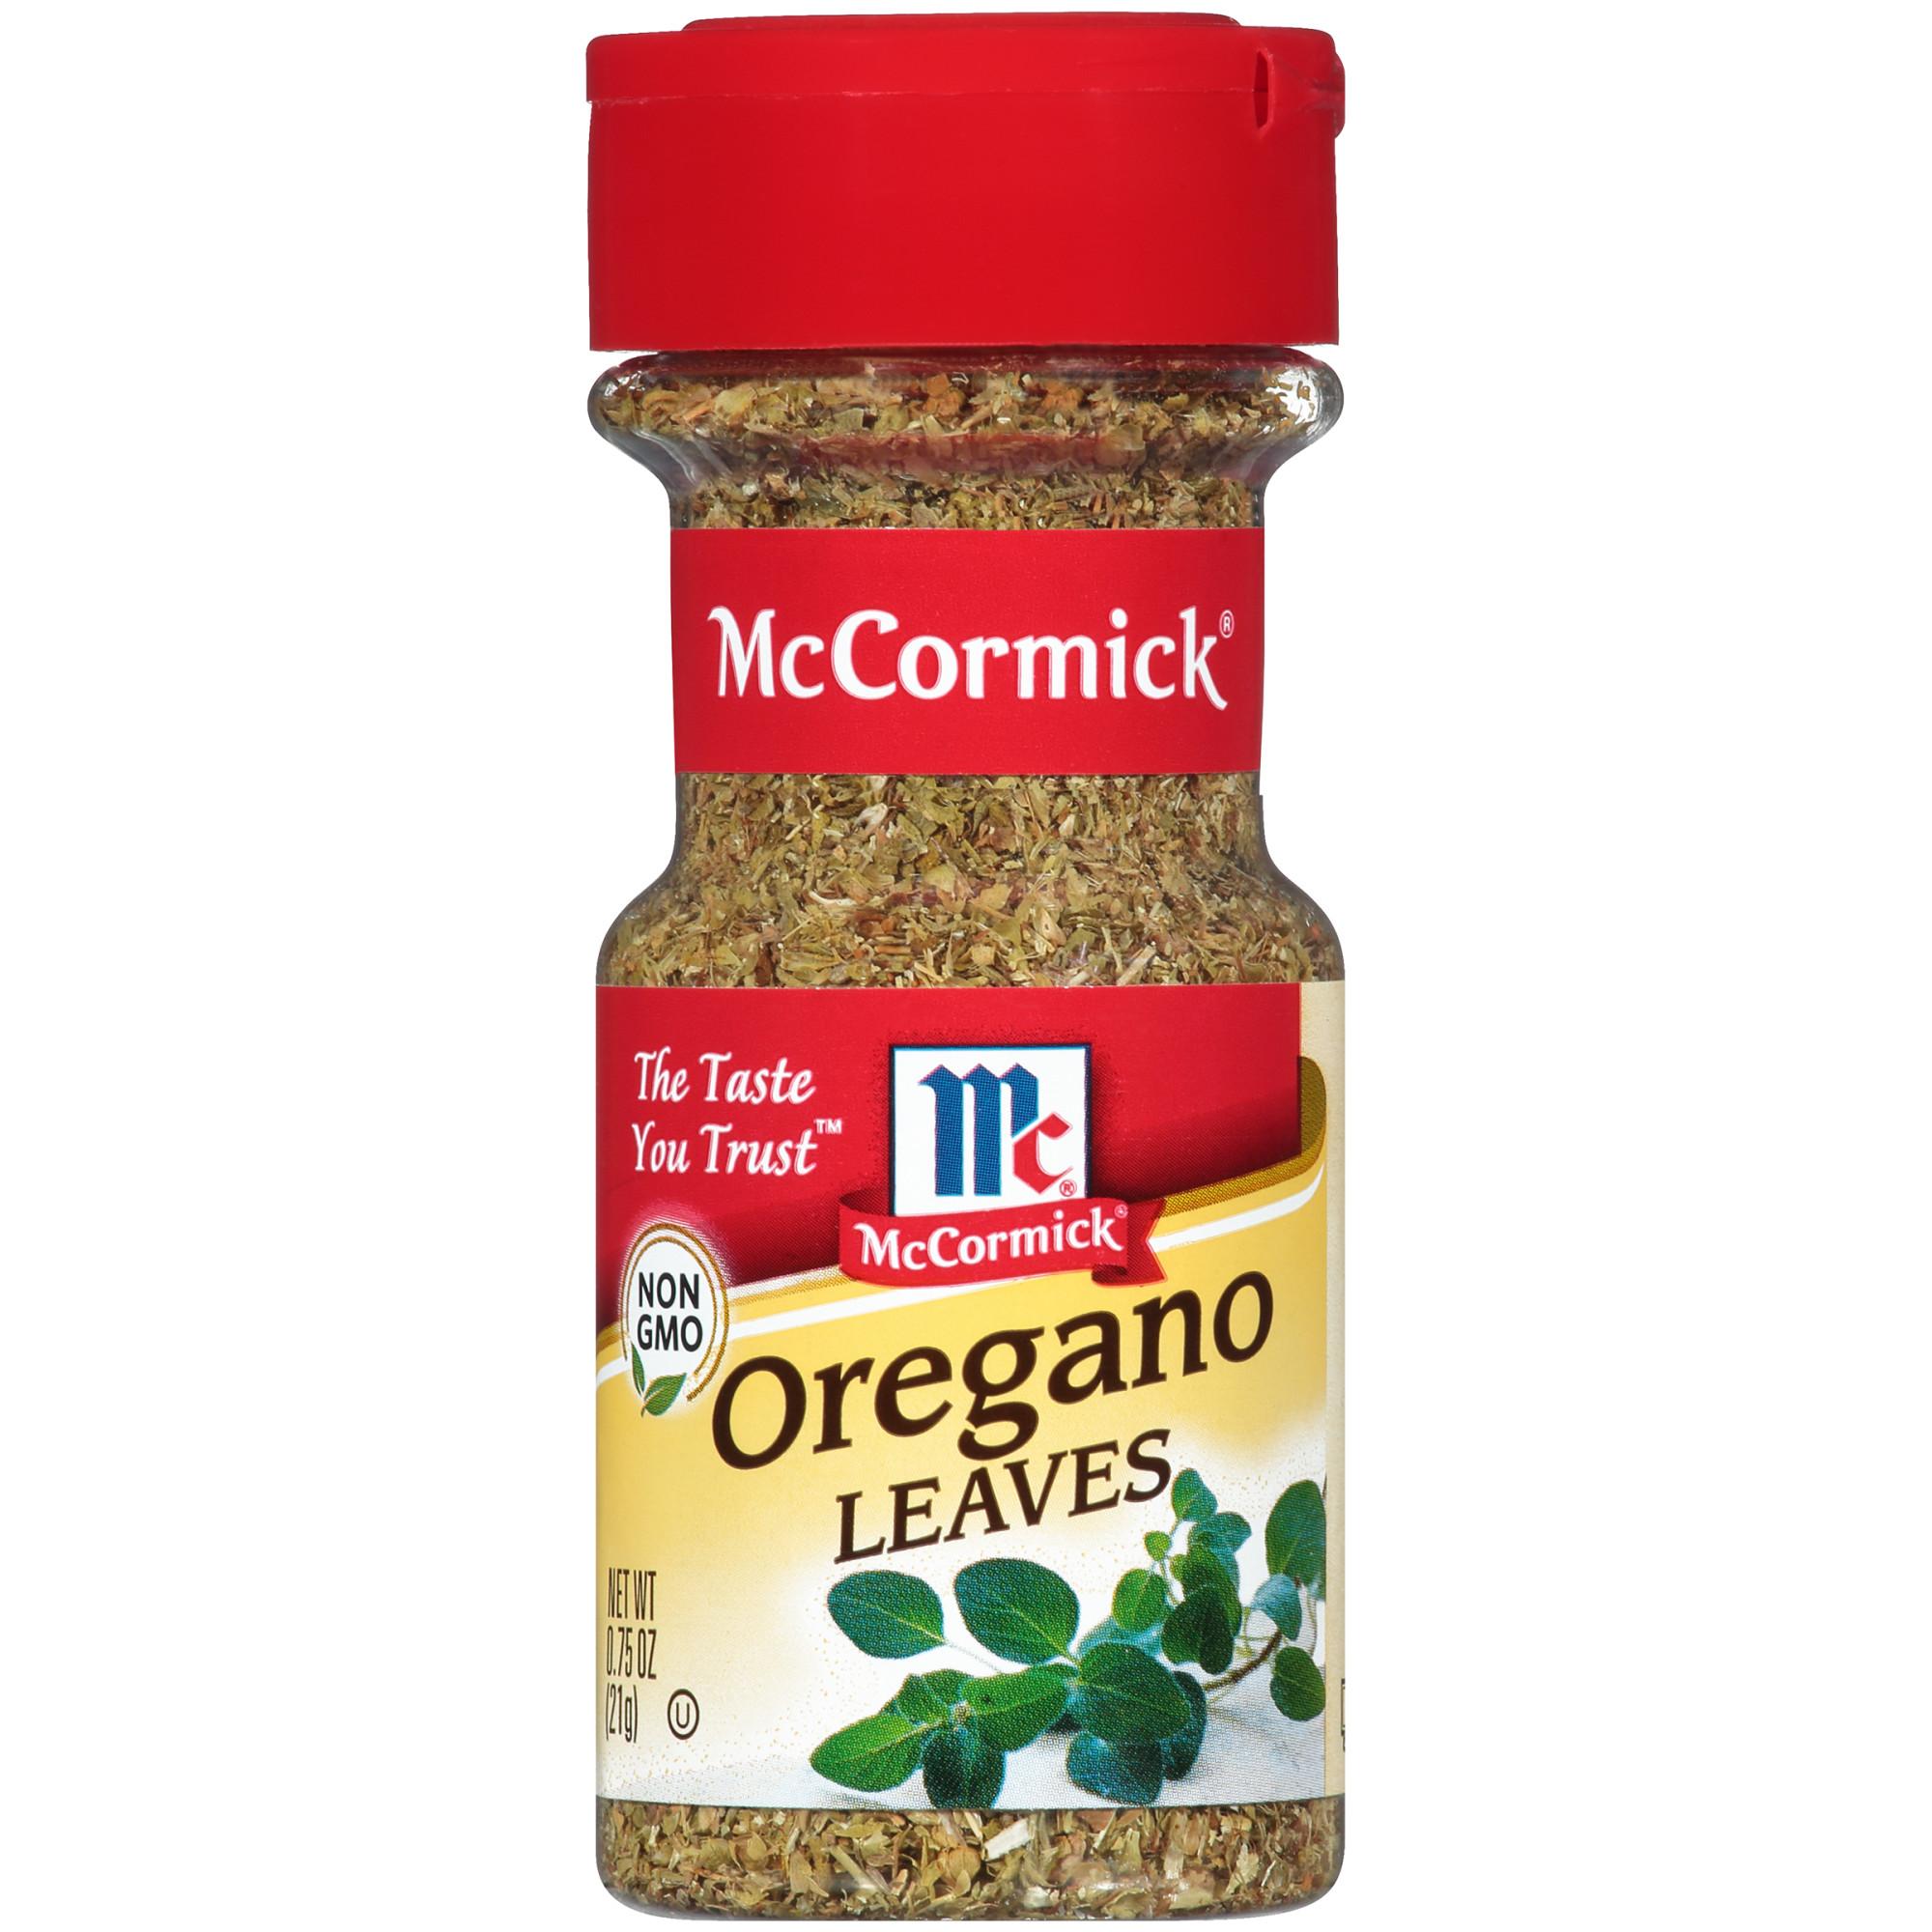 (2 Pack) McCormick Oregano Leaves, 0.75 oz